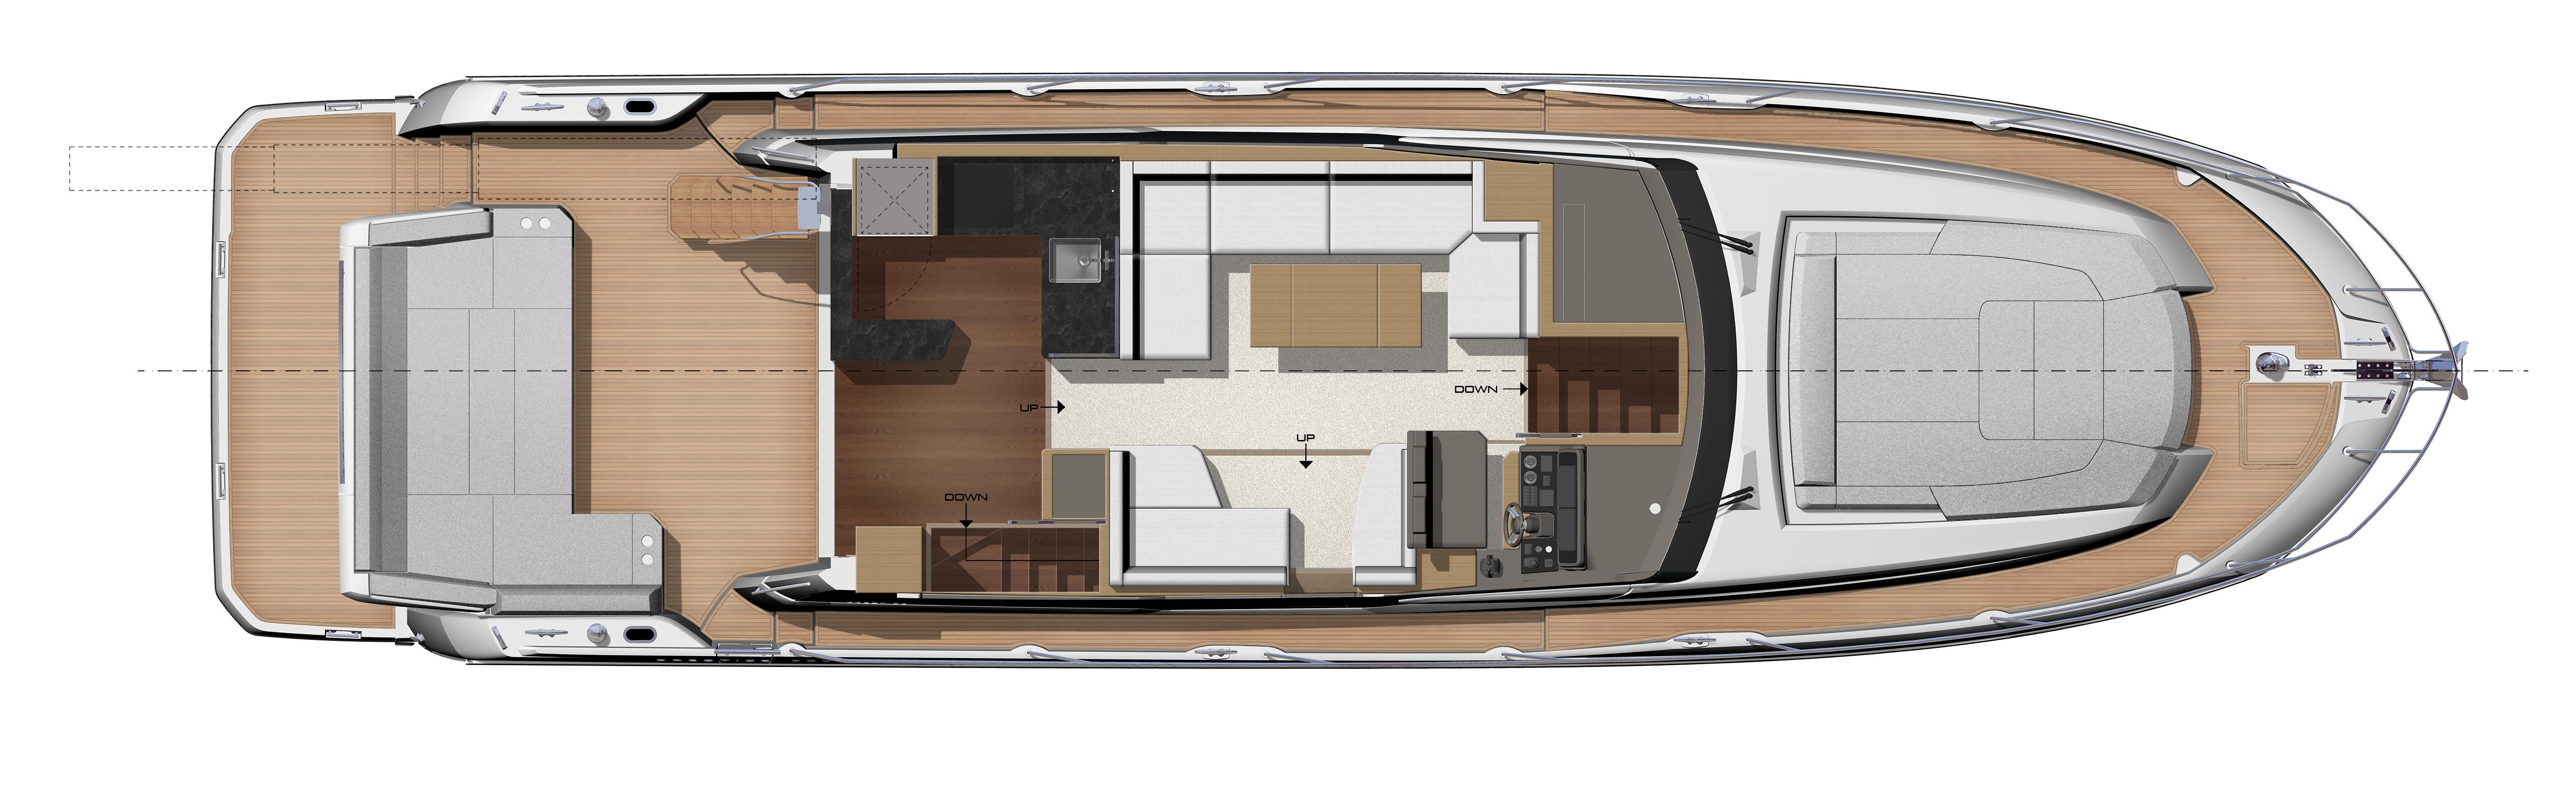 PRESTIGE-590S---Main-Deck---Relax-cockpit-